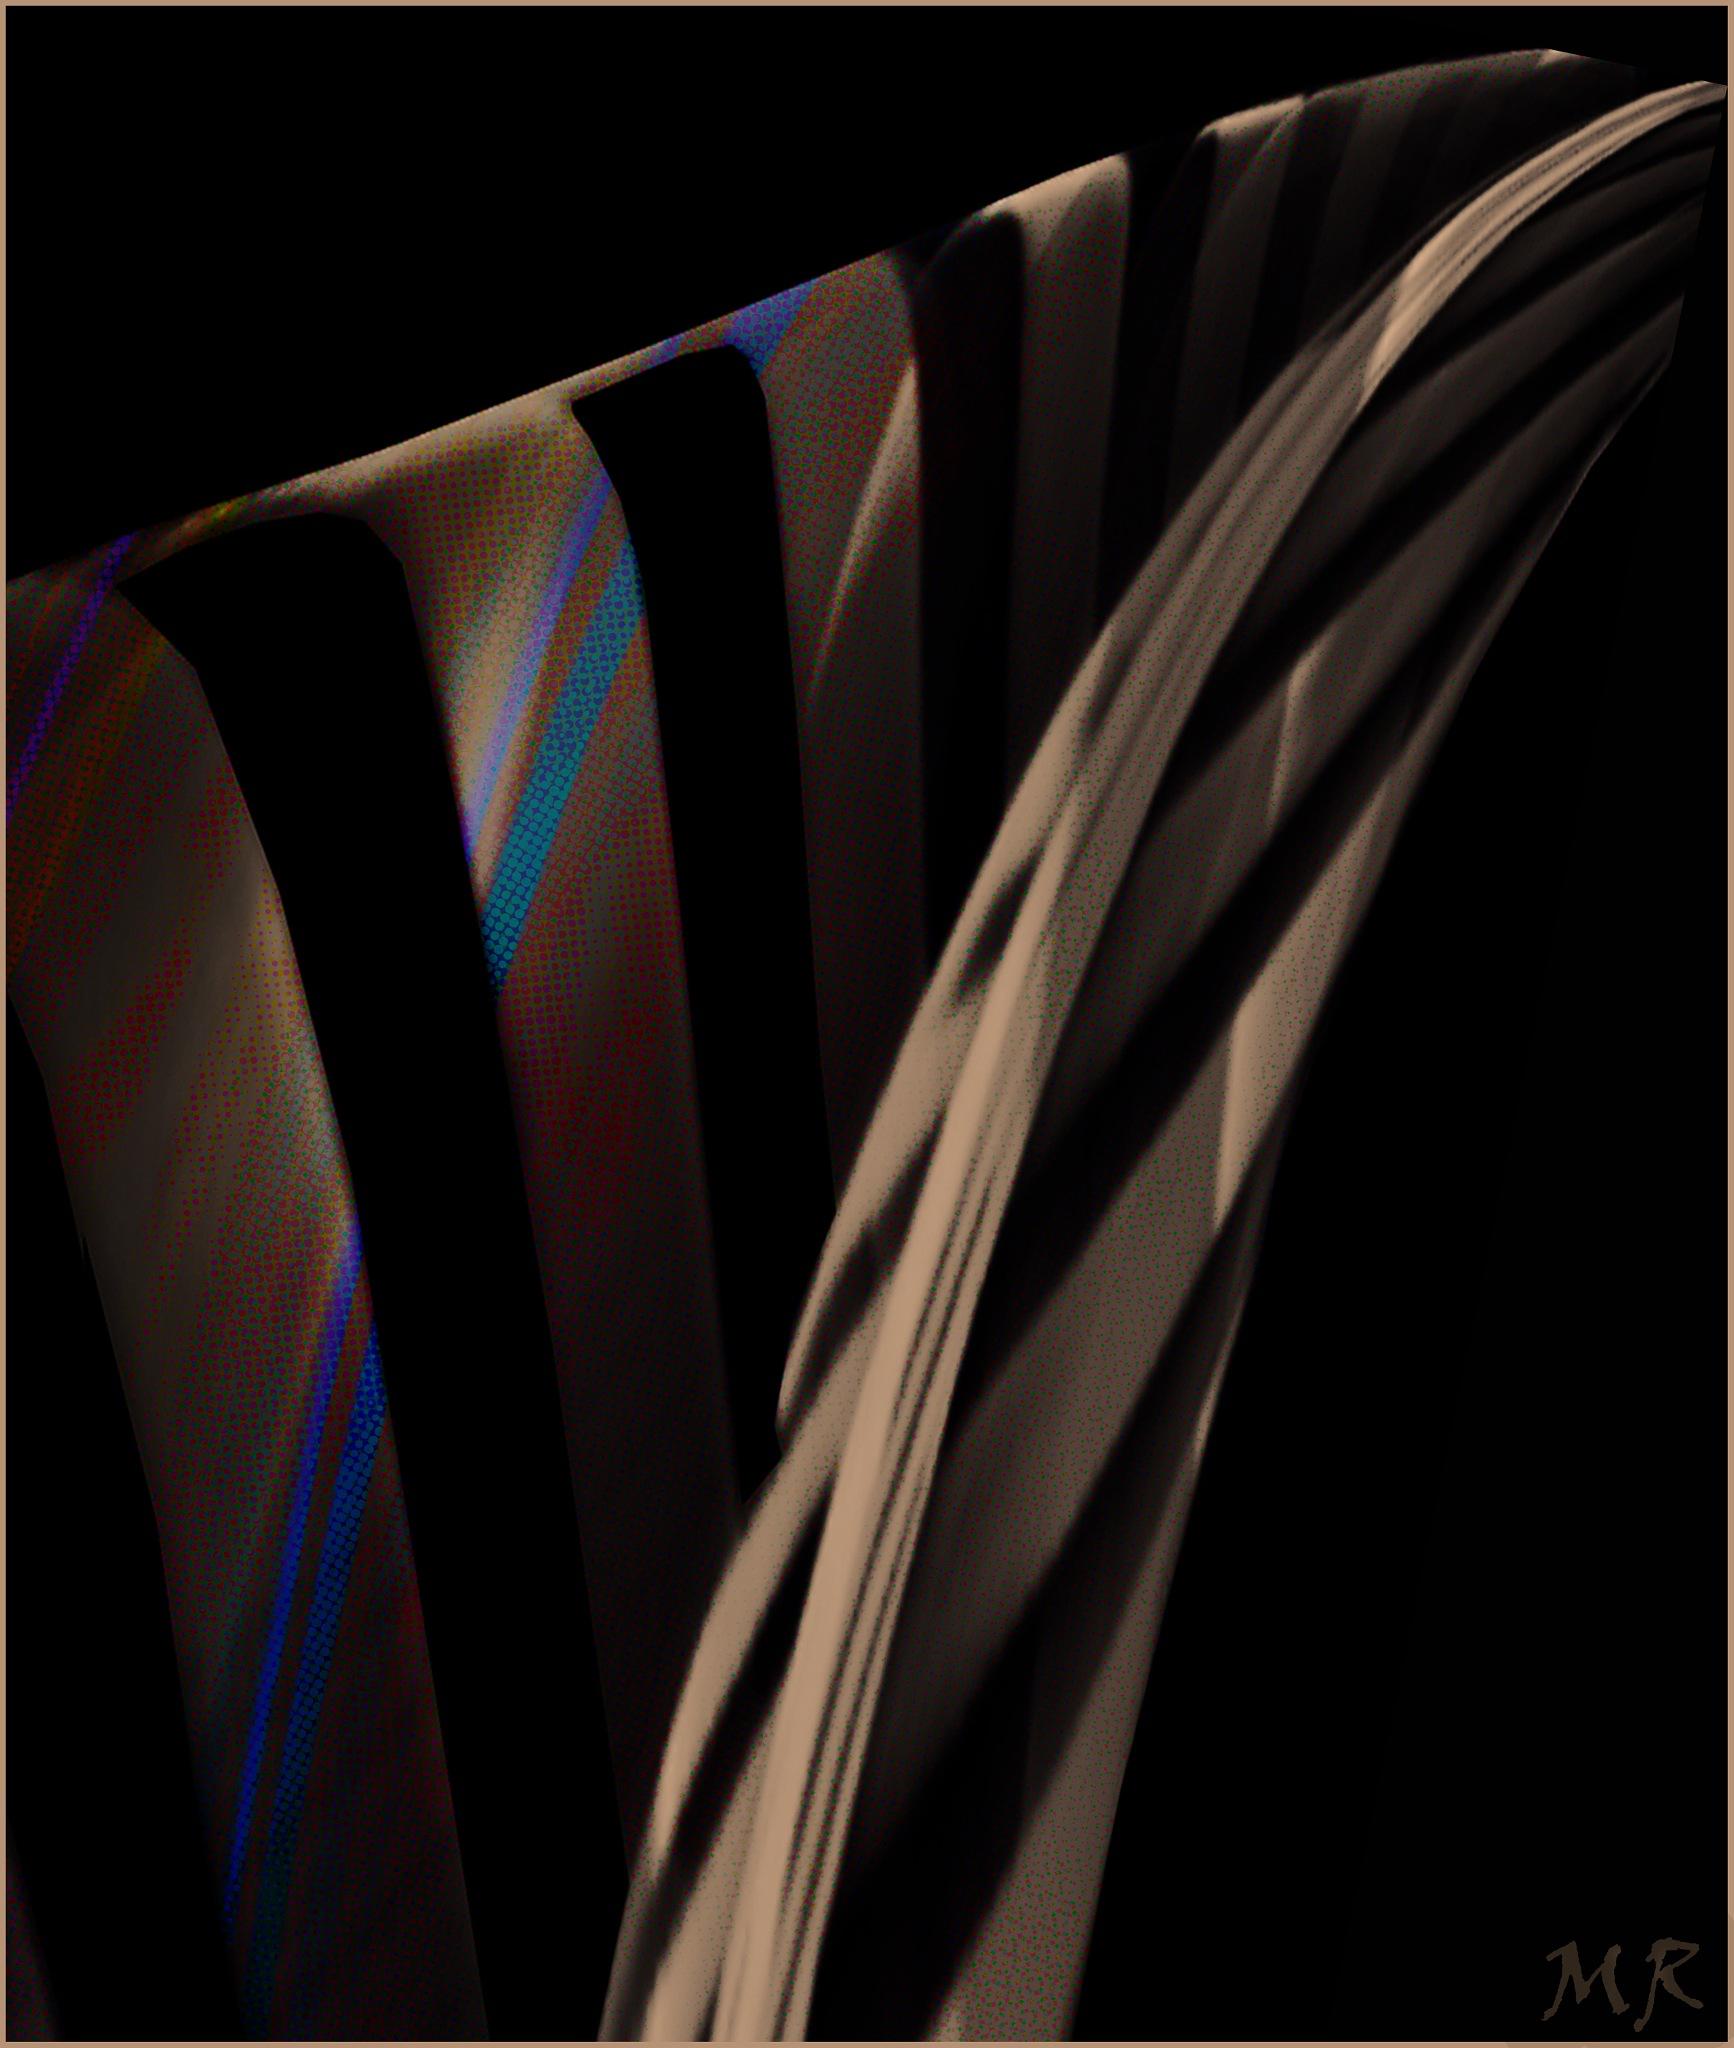 Shadows by Mikael Rennerhorn